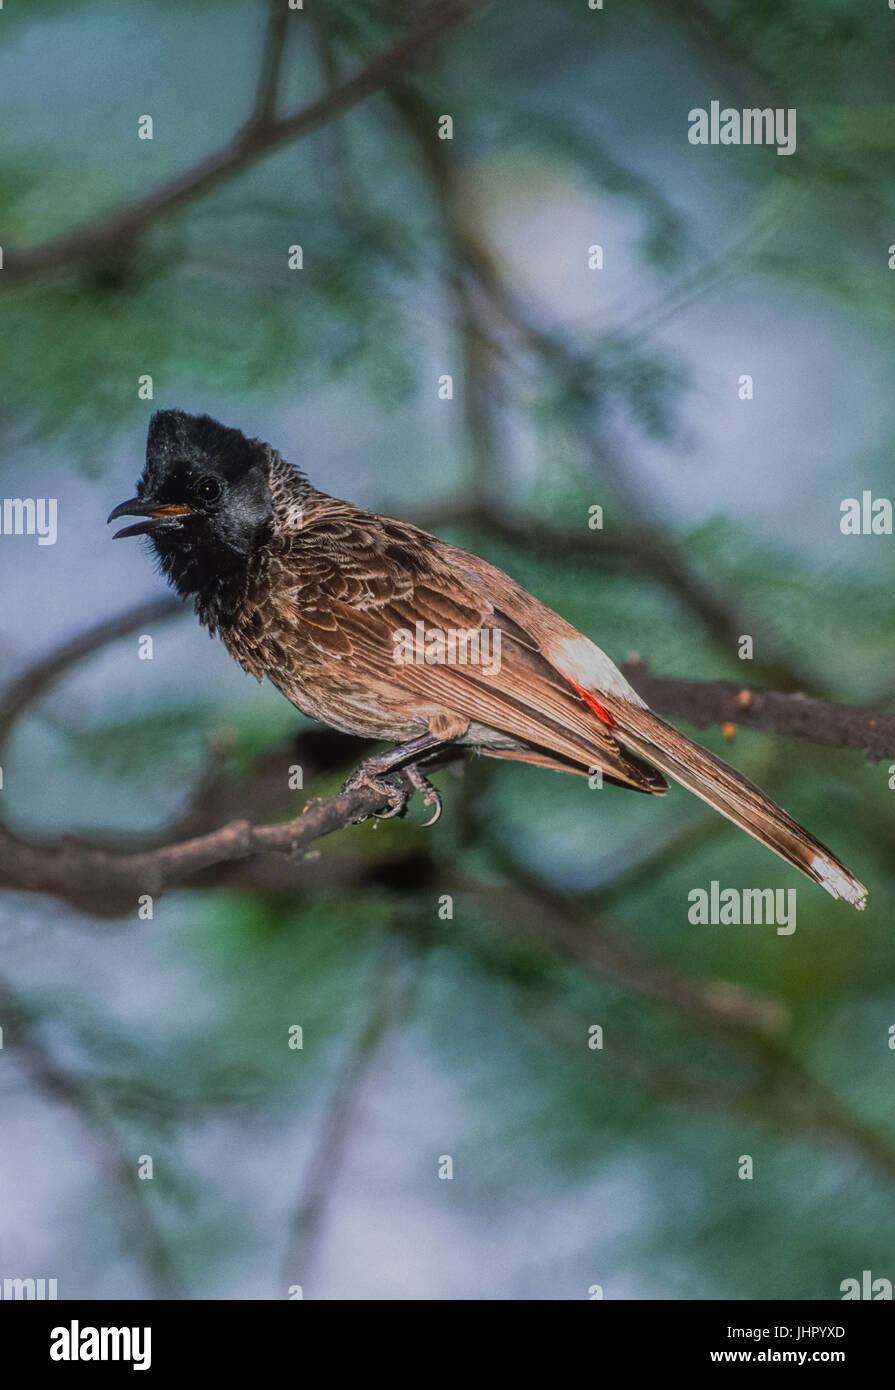 Red-vented bulbul, (red-vented bulbul (Pycnonotus cafer bengalensis), Keoladeo Ghana National Park, Bharatpur, Rajasthan, - Stock Image